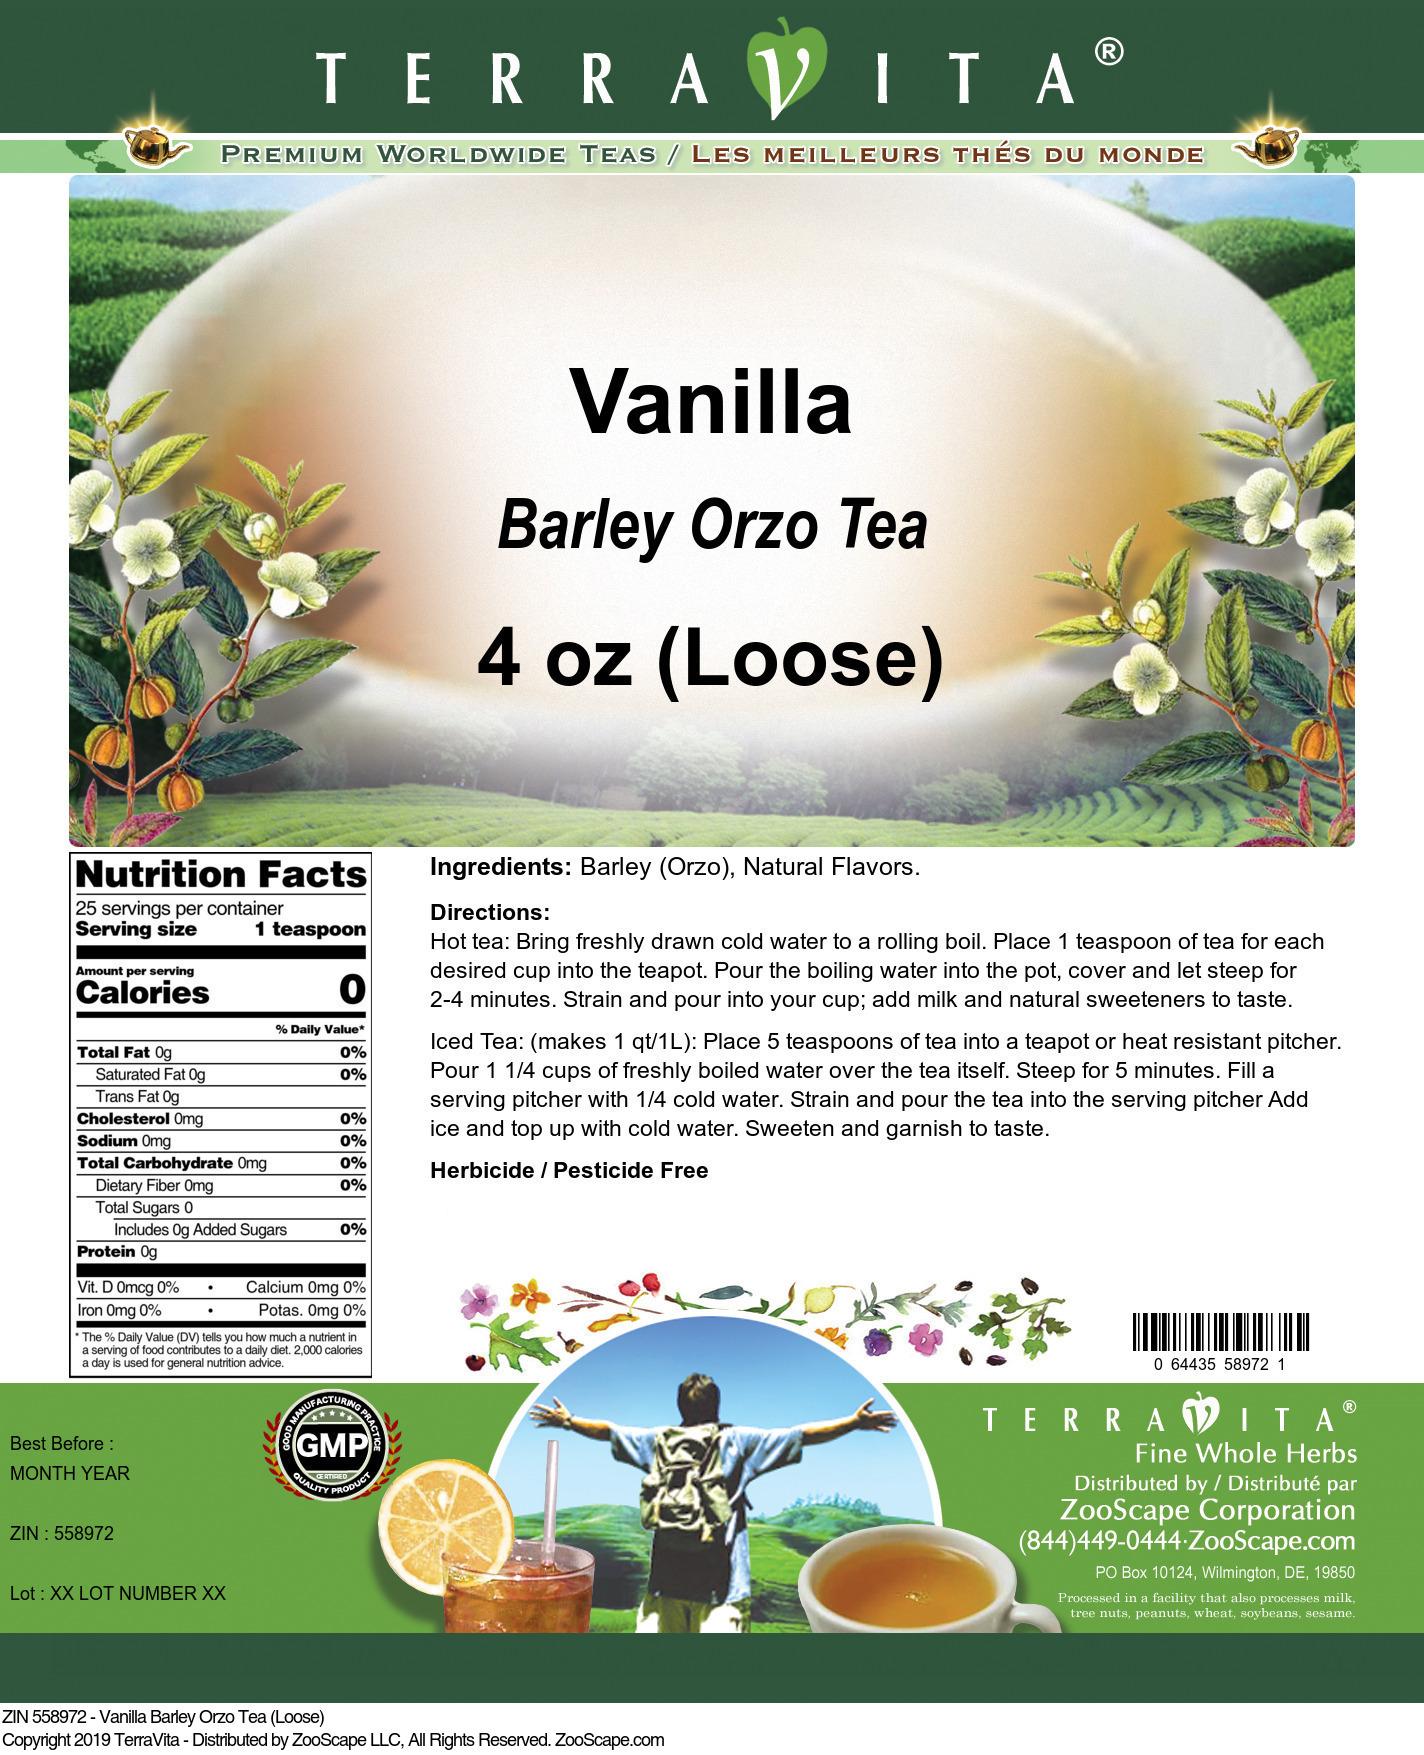 Vanilla Barley Orzo